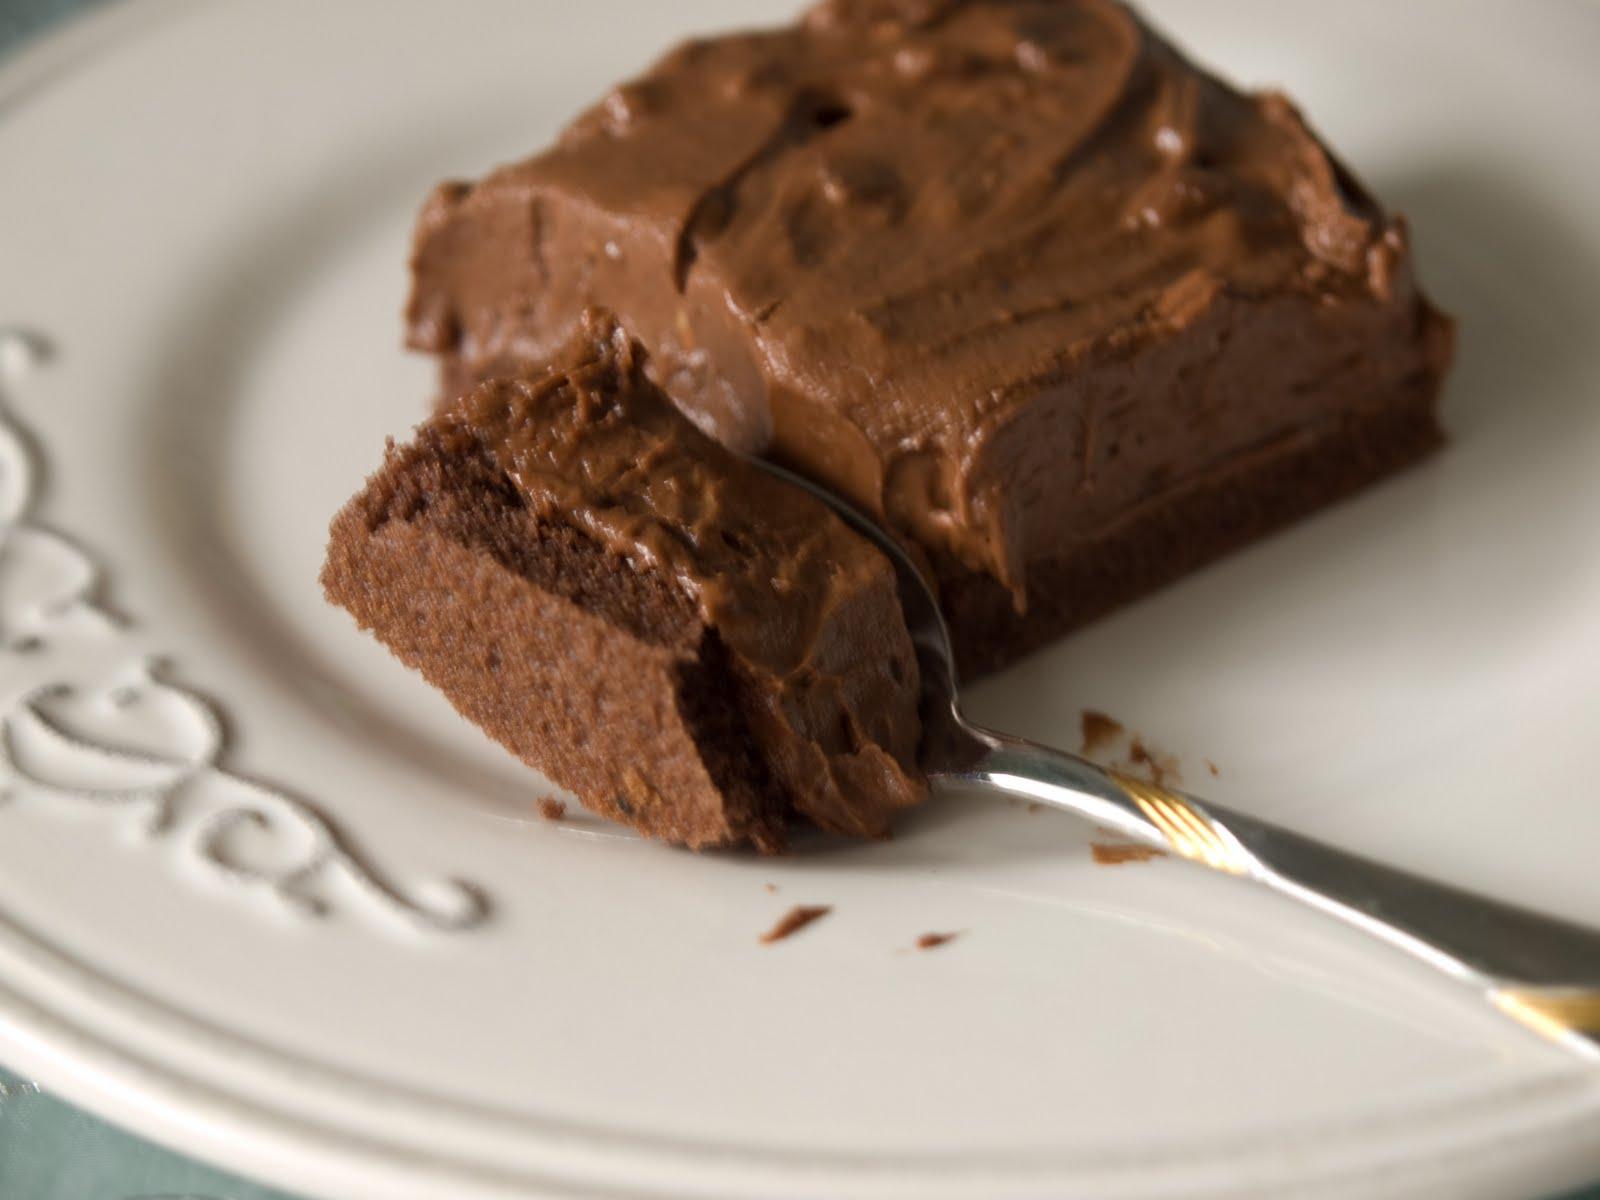 Jeftini Kolaci http://ajilbab.com/torte/torte-kolai-recepti-slikama